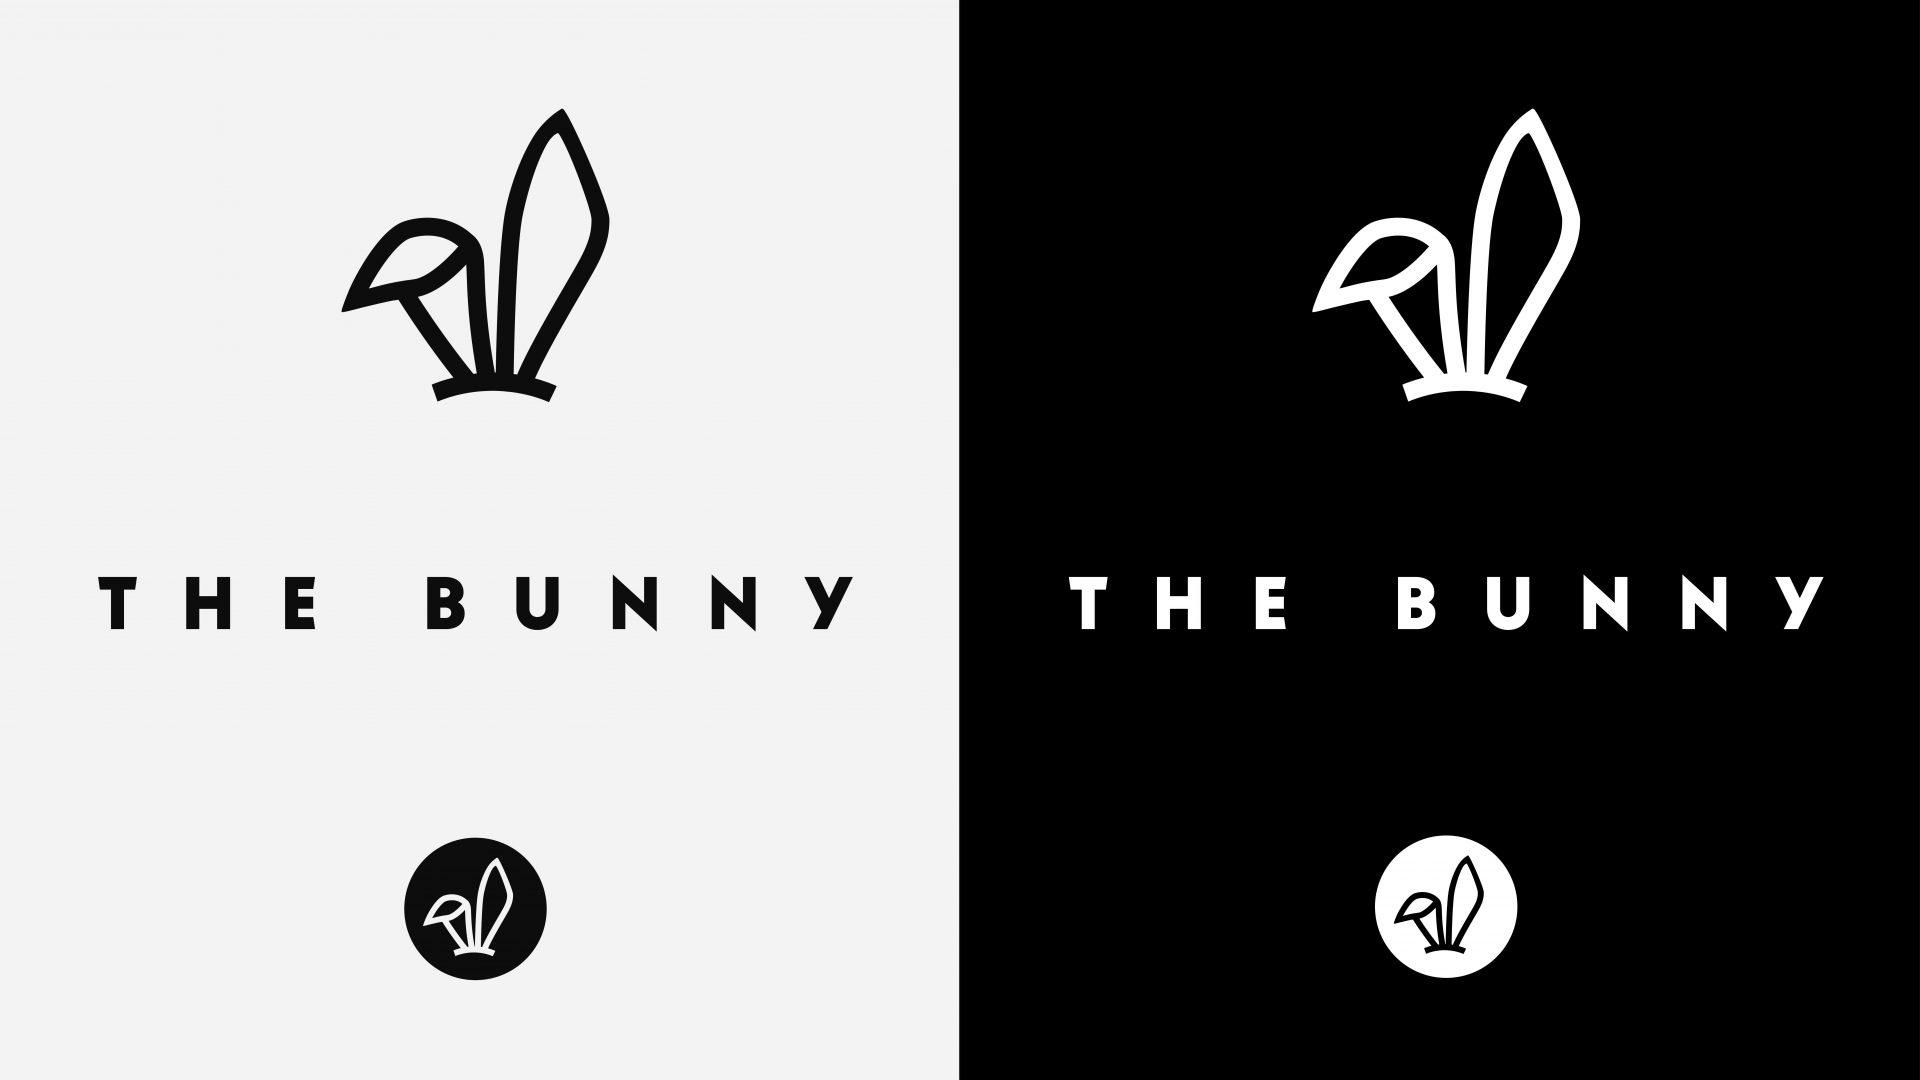 Crate47 Branding for The Bunny bubble tea shop – black logo on white, white logo on black